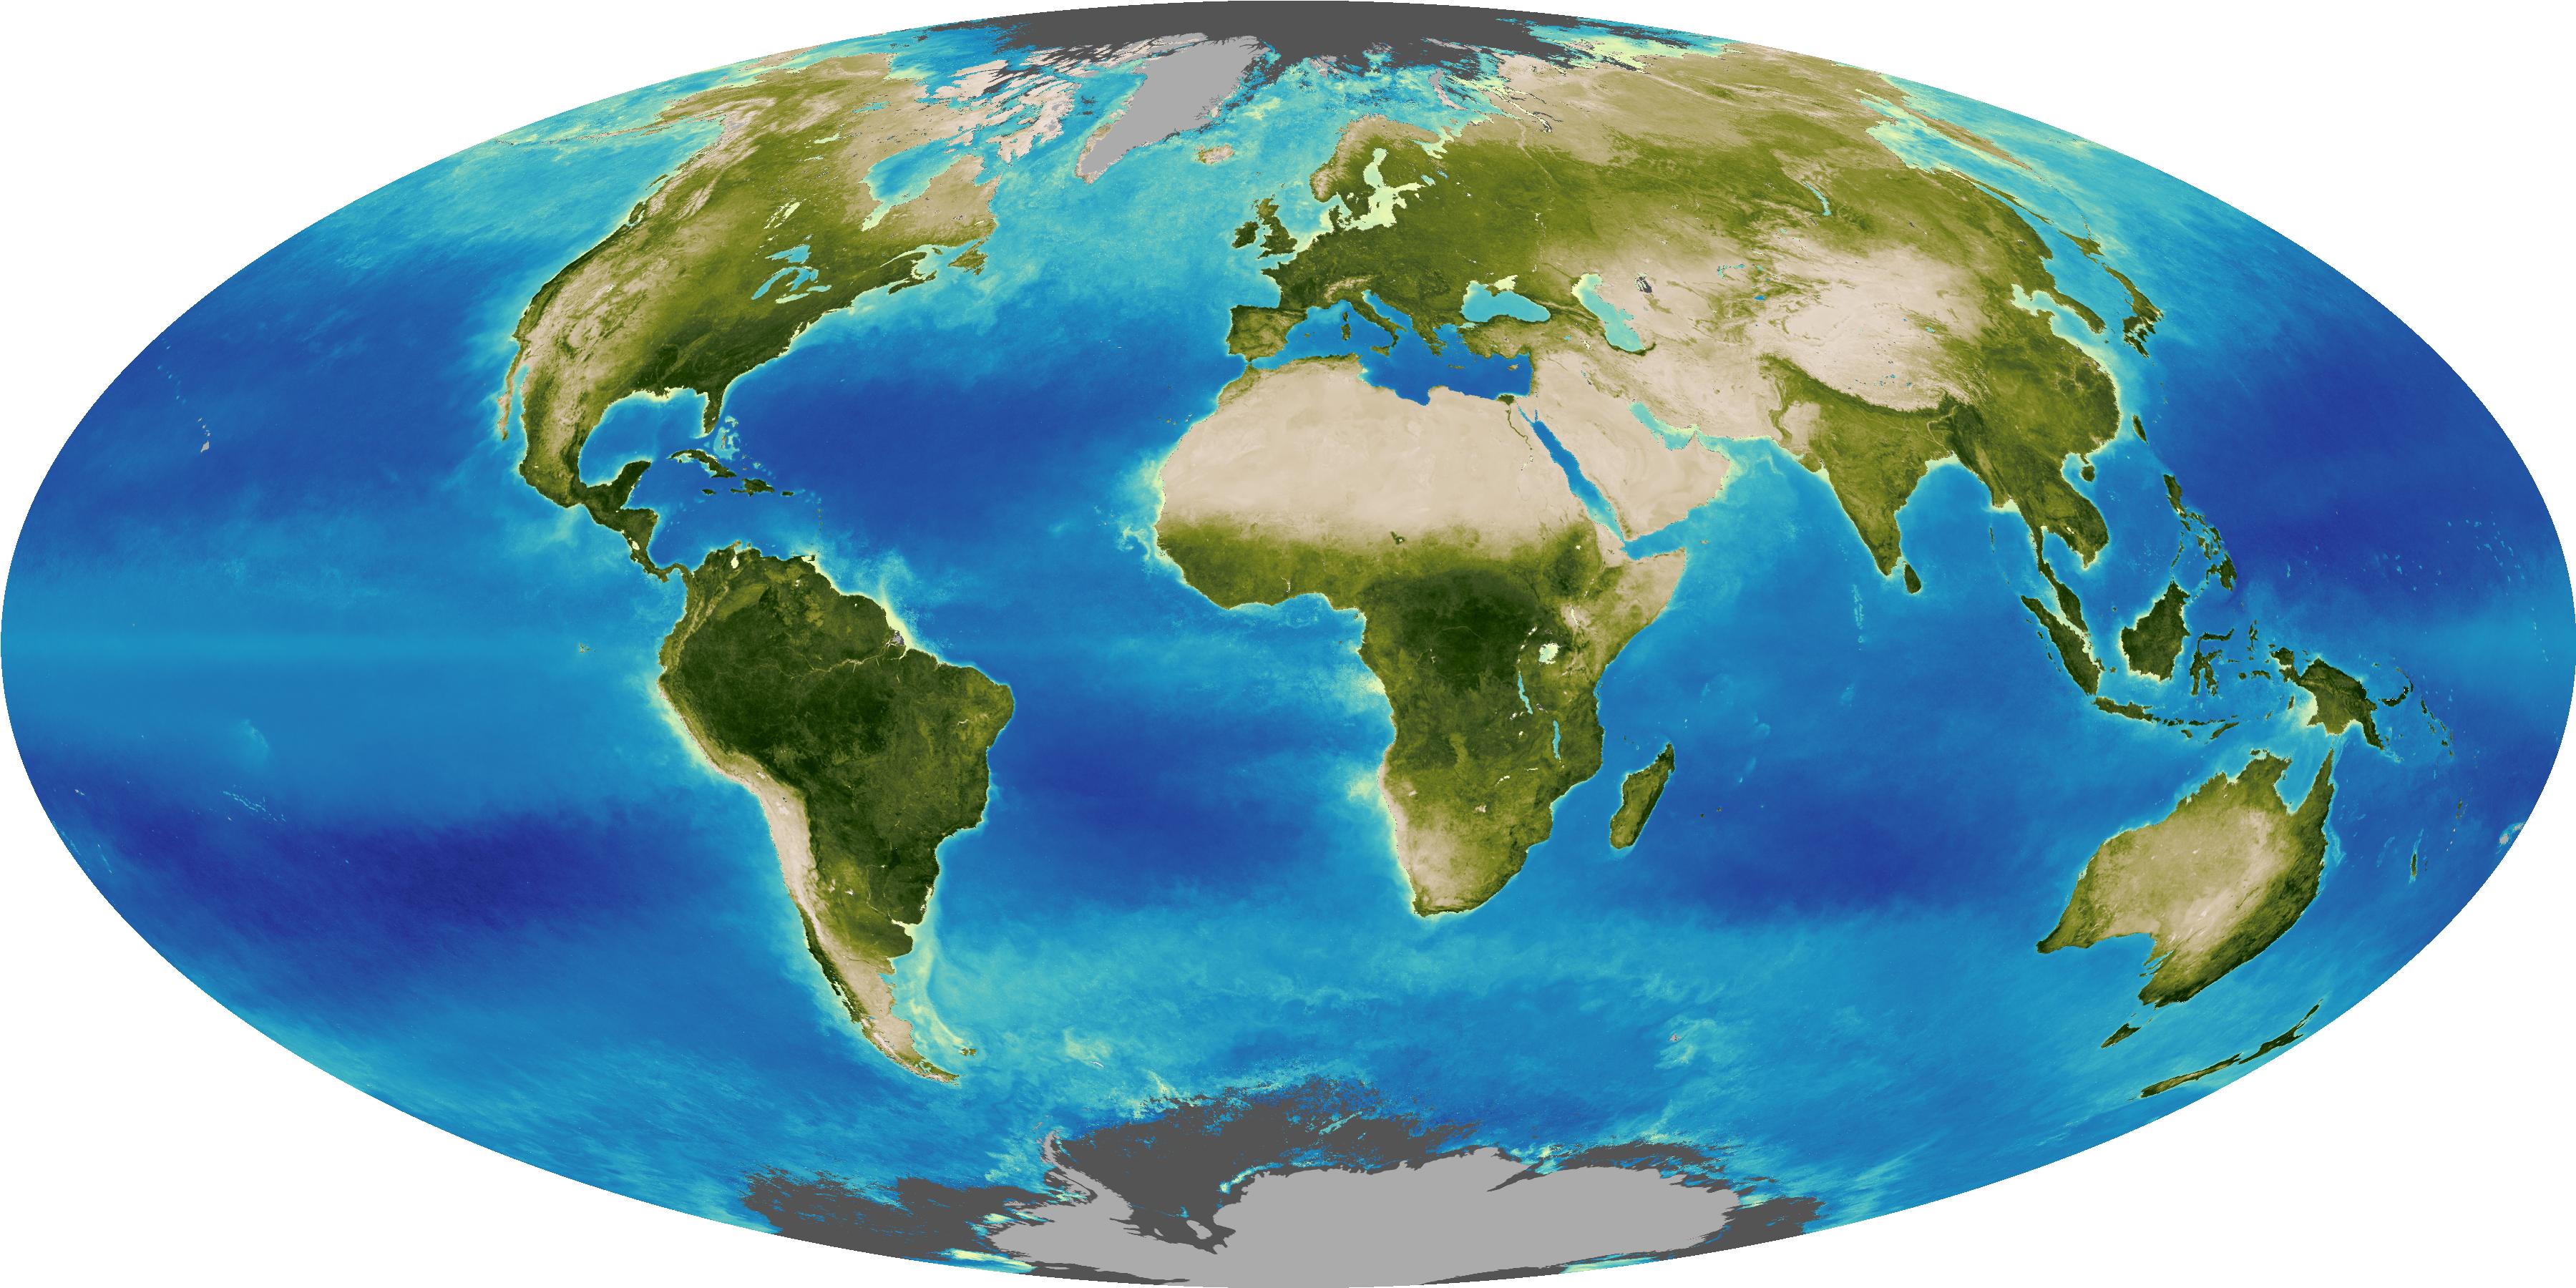 Nasa Visible Earth Global Biosphere